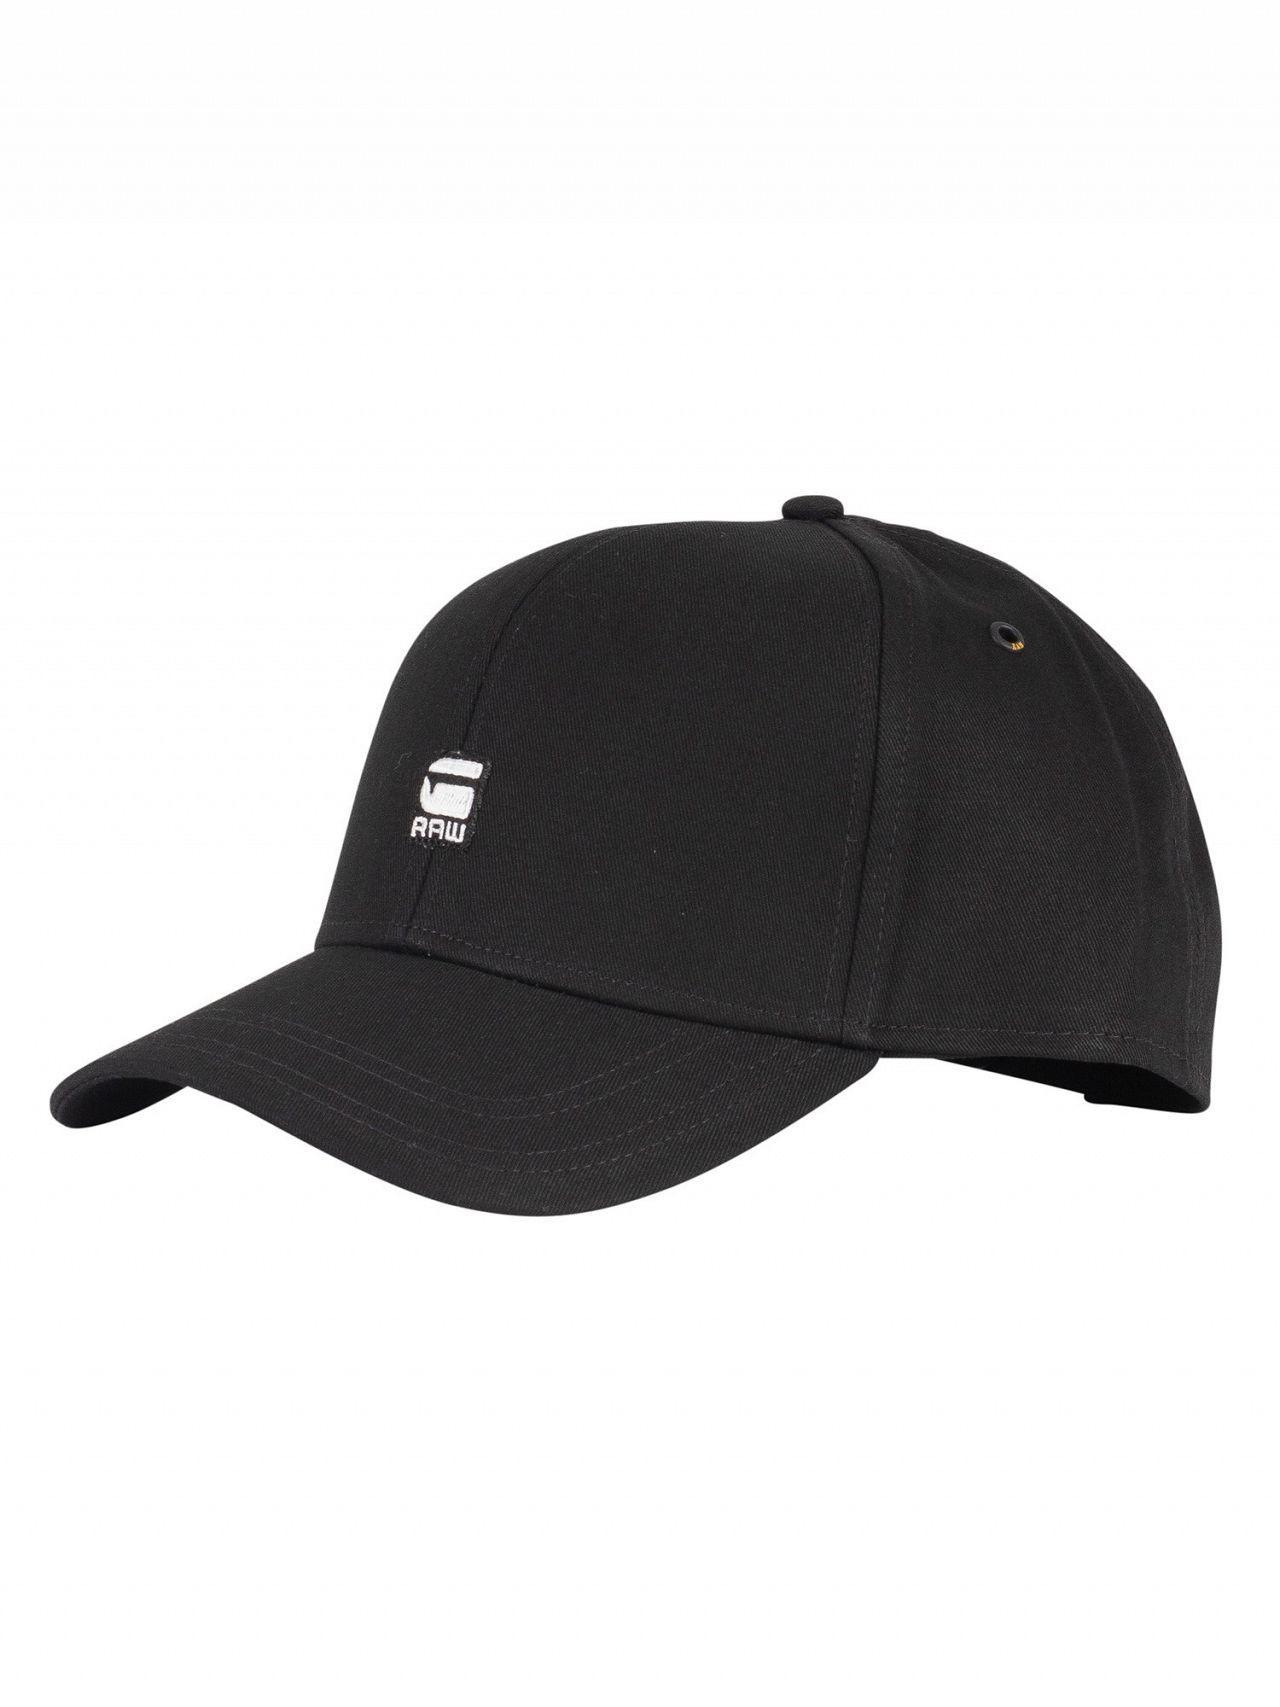 G-Star RAW Dark Black Originals Baseball Cap in Black for Men - Save ... 70699e012db9